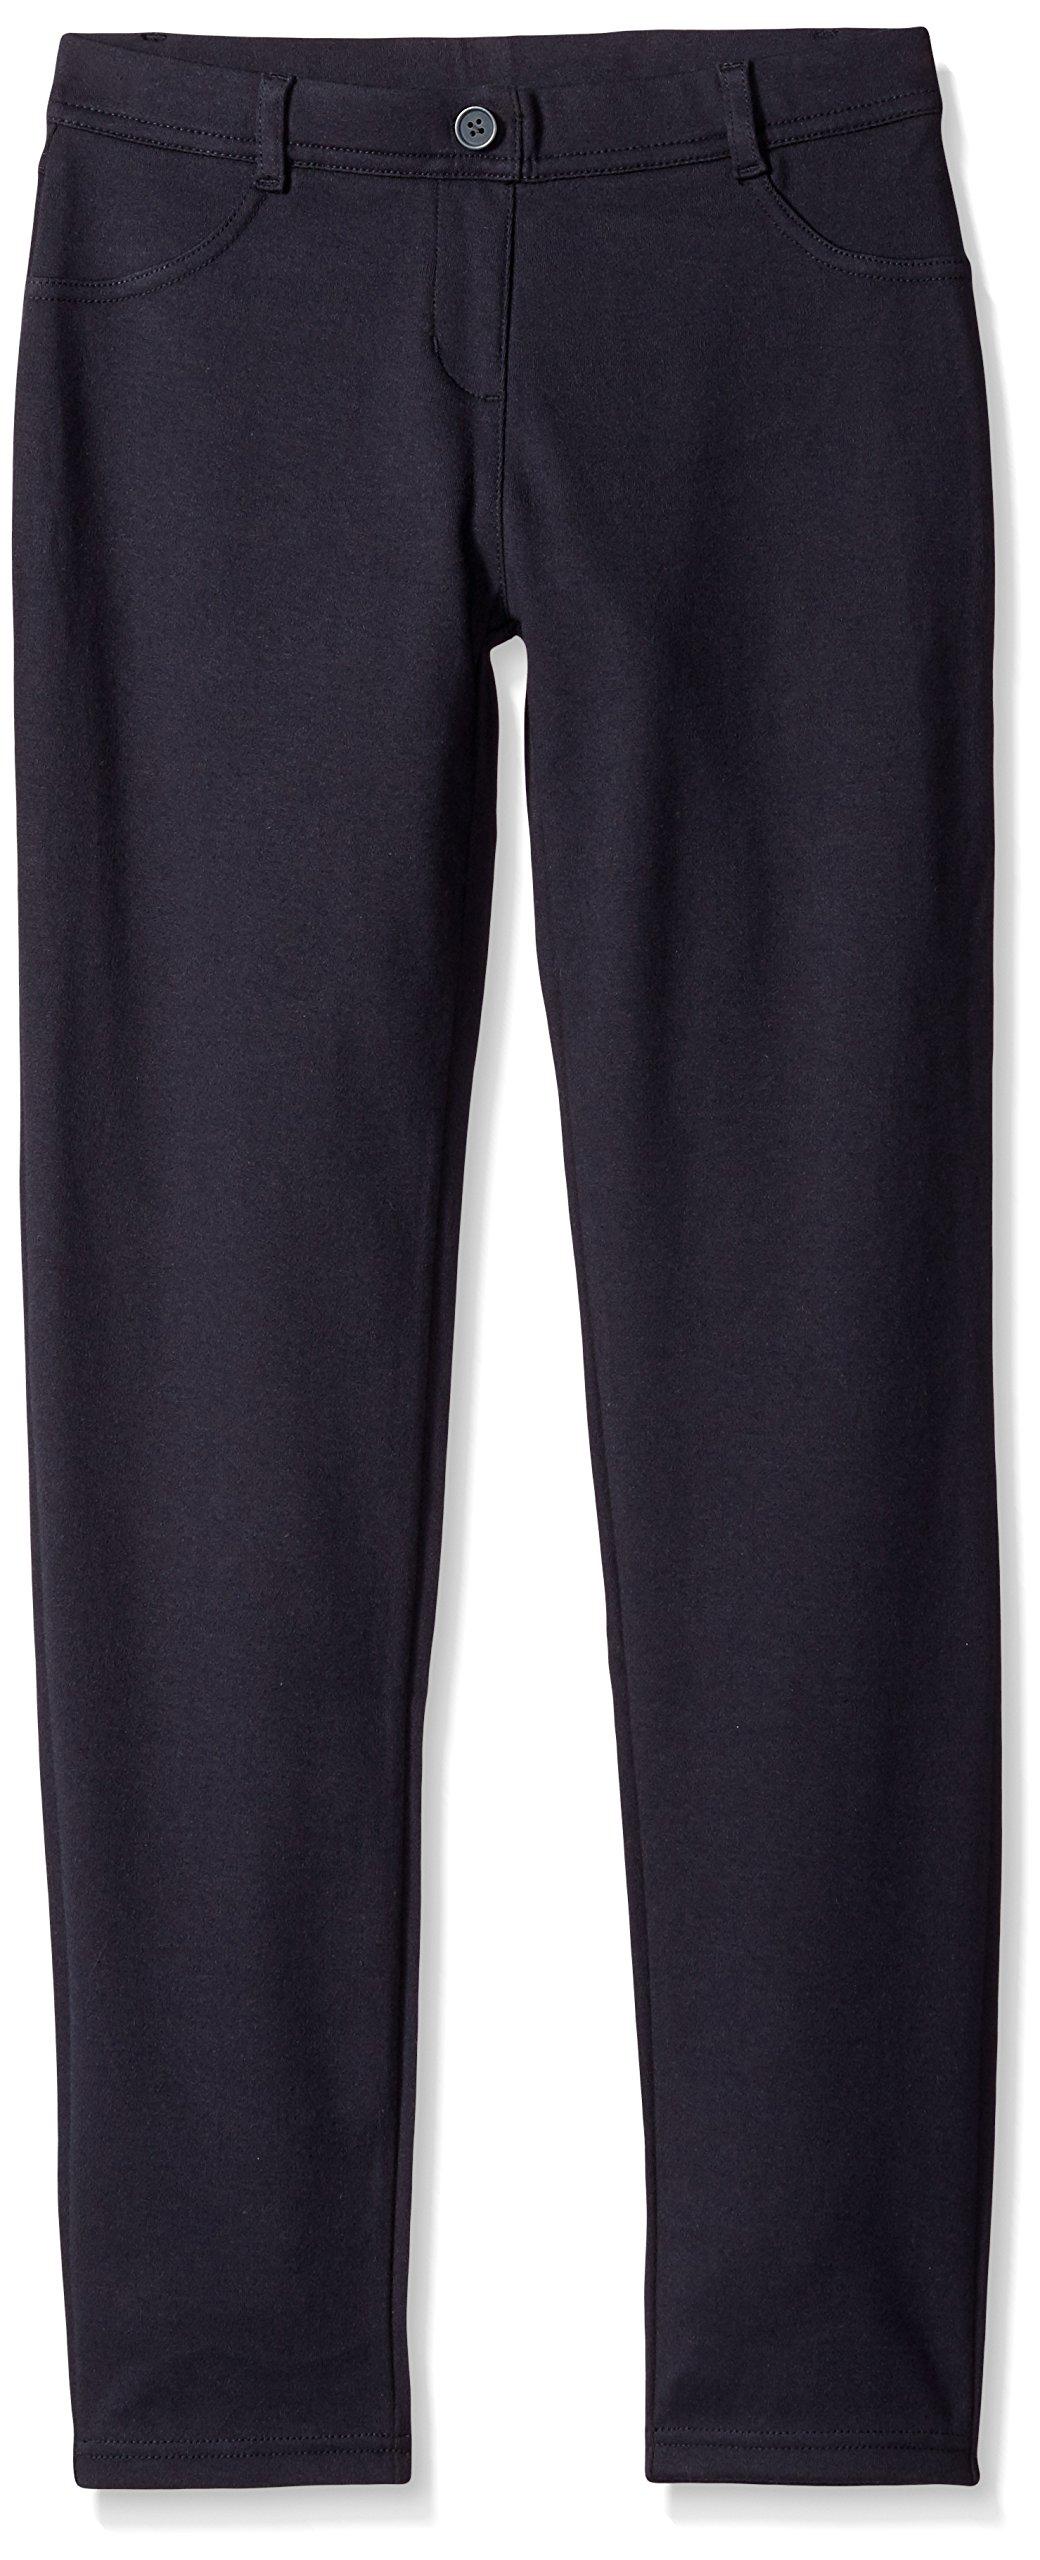 Nautica Girls' Big School Uniform Stretch Interlock Legging, Navy, 7